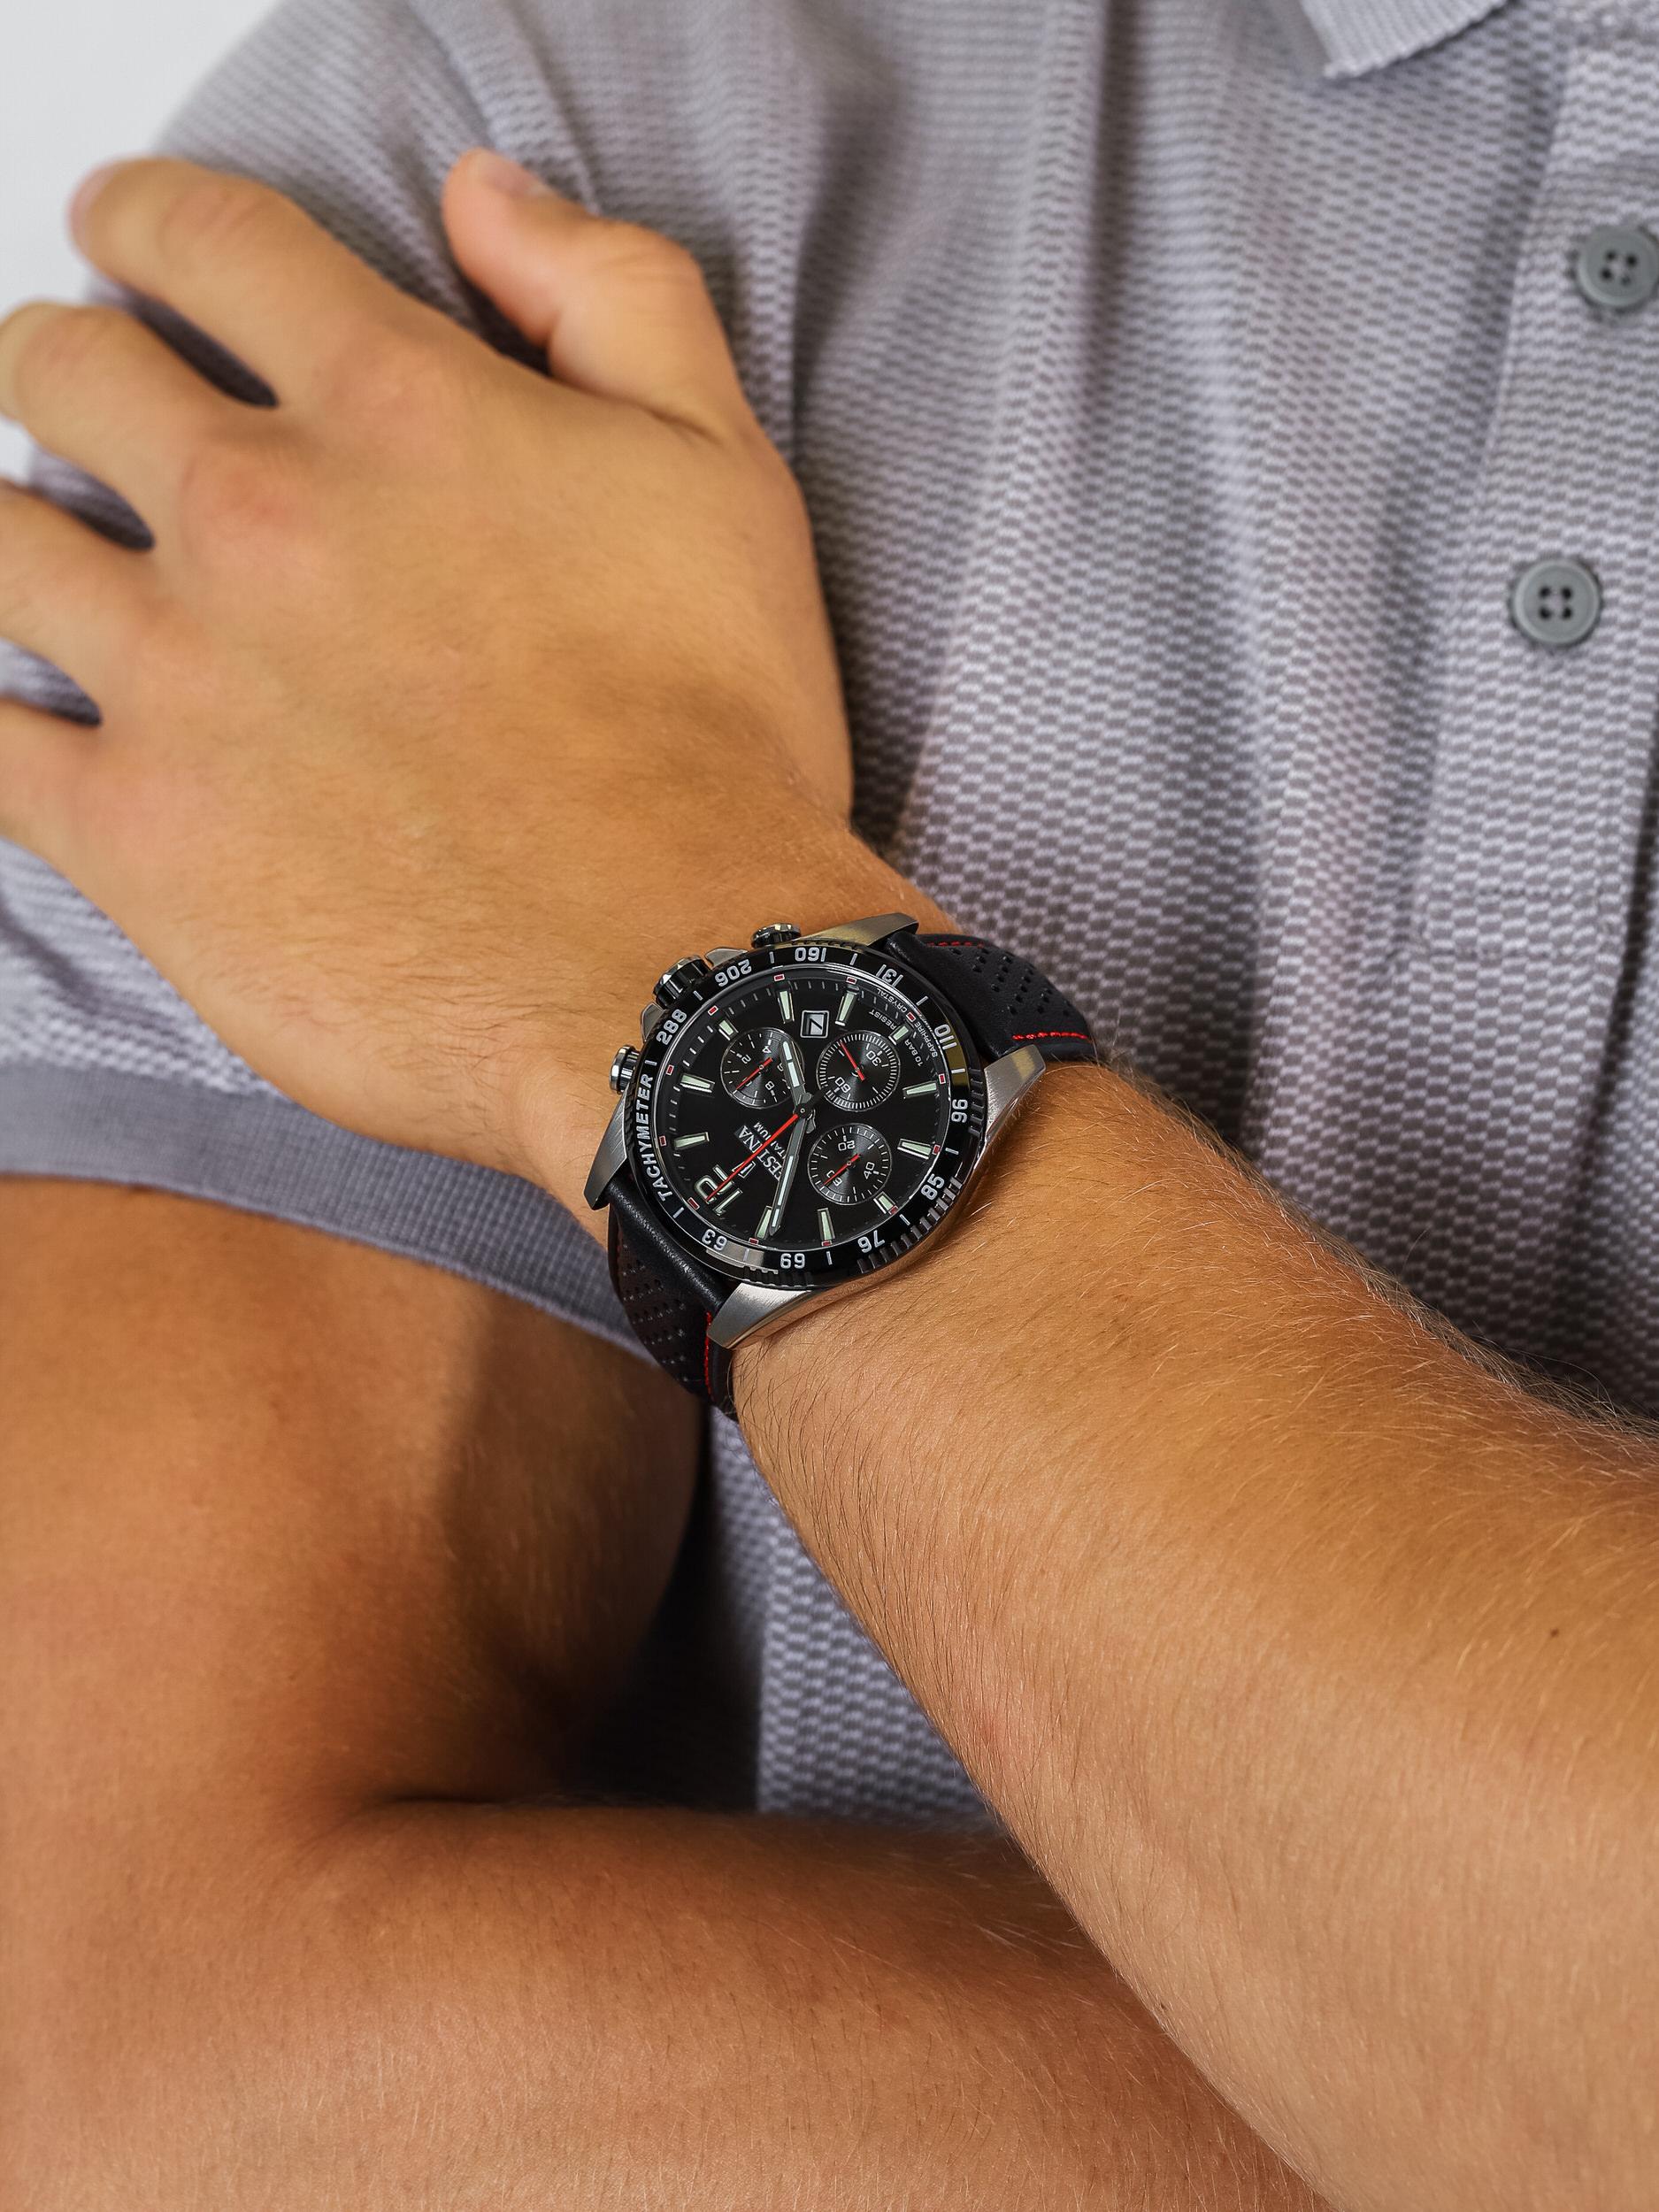 zegarek Festina F20521-4 Titanium Sport Chrono Sapphire męski z tachometr Titanium